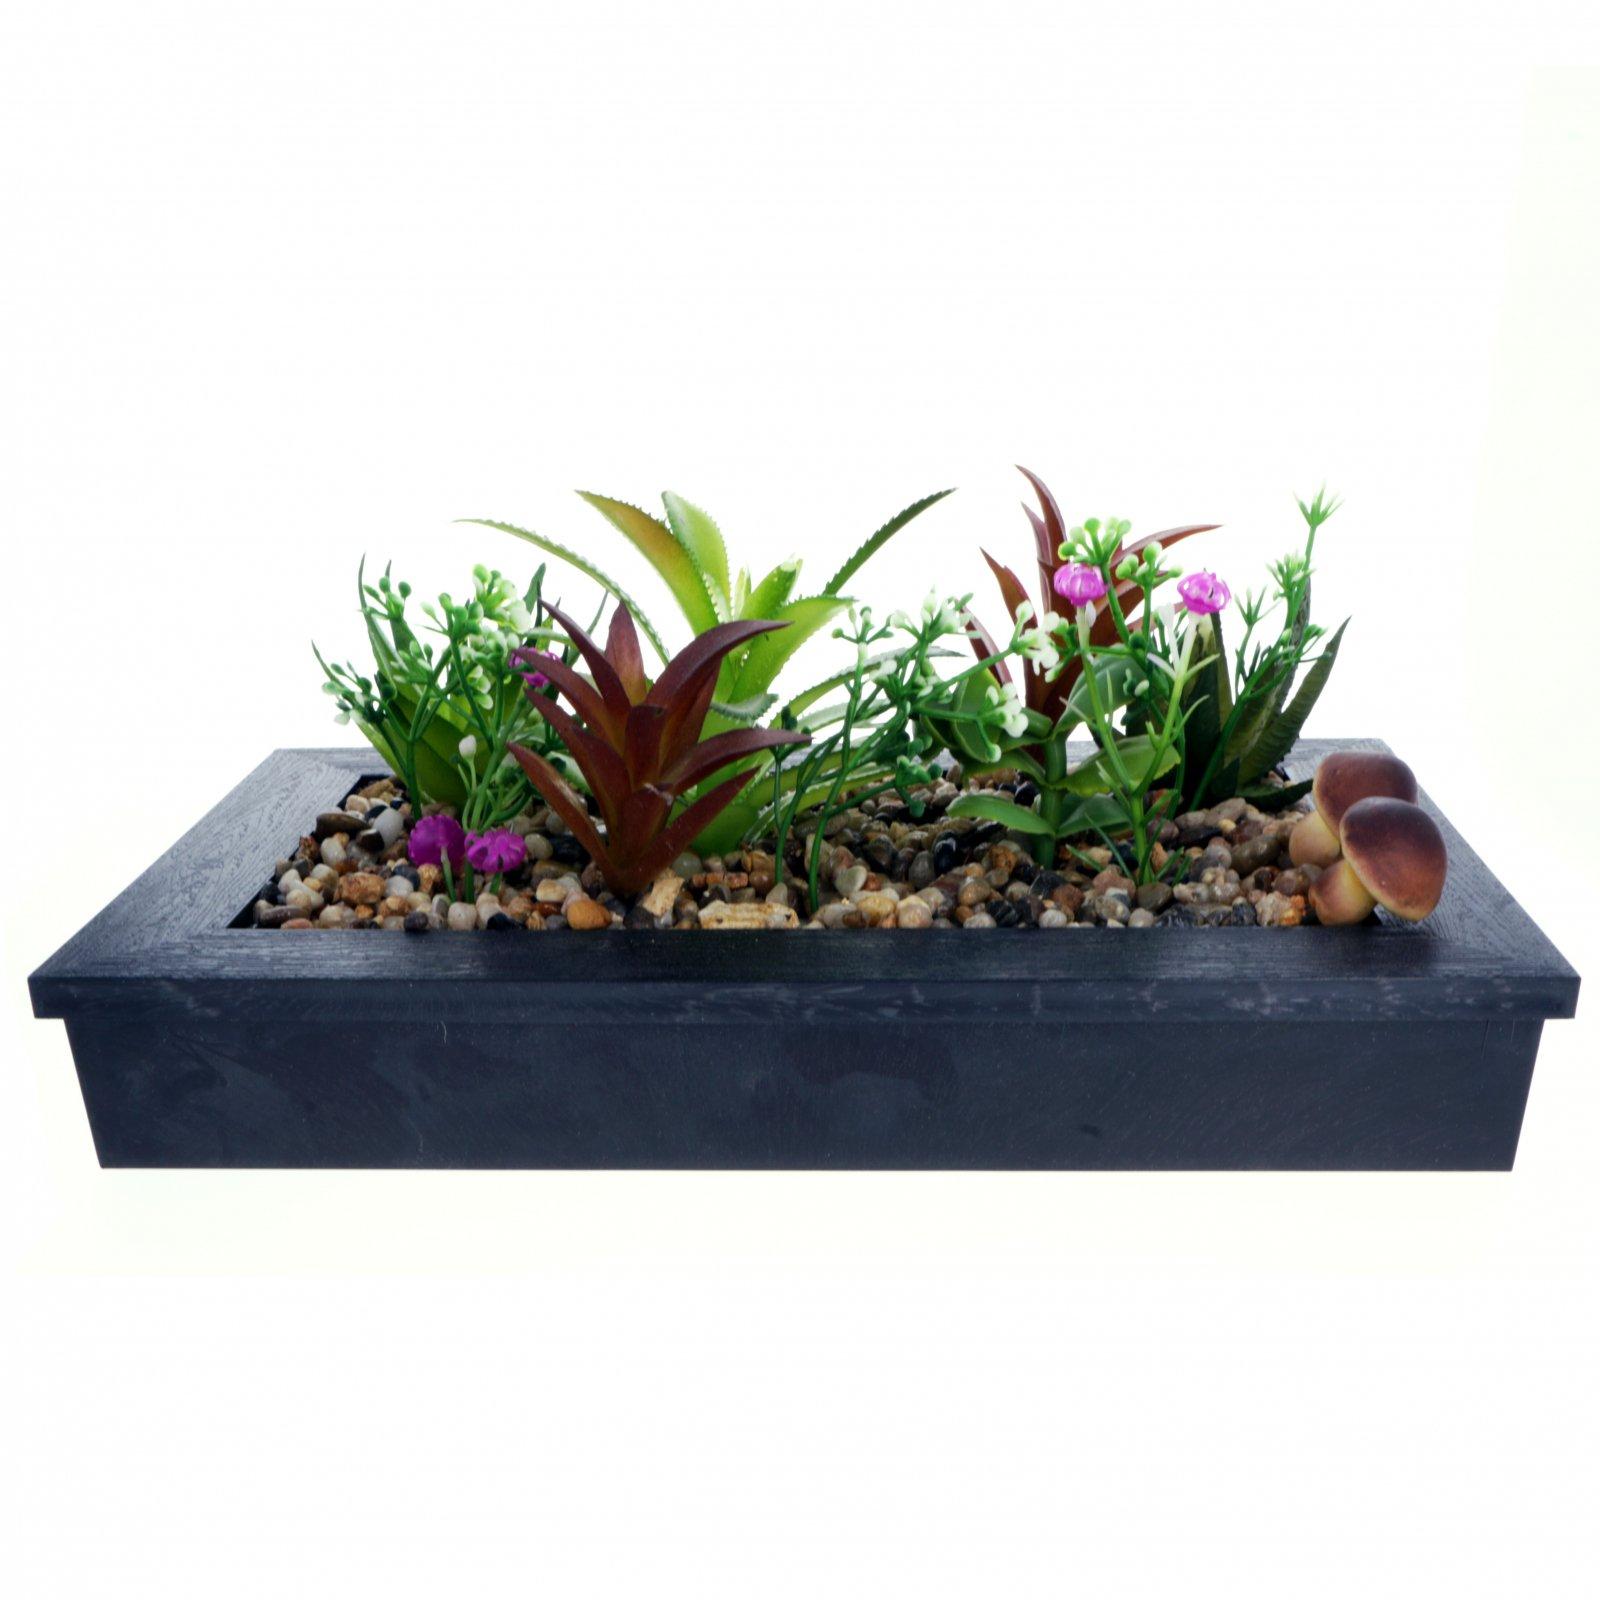 Home Essentials Decor Artificial Plant Succulent Garden in Planter - Black